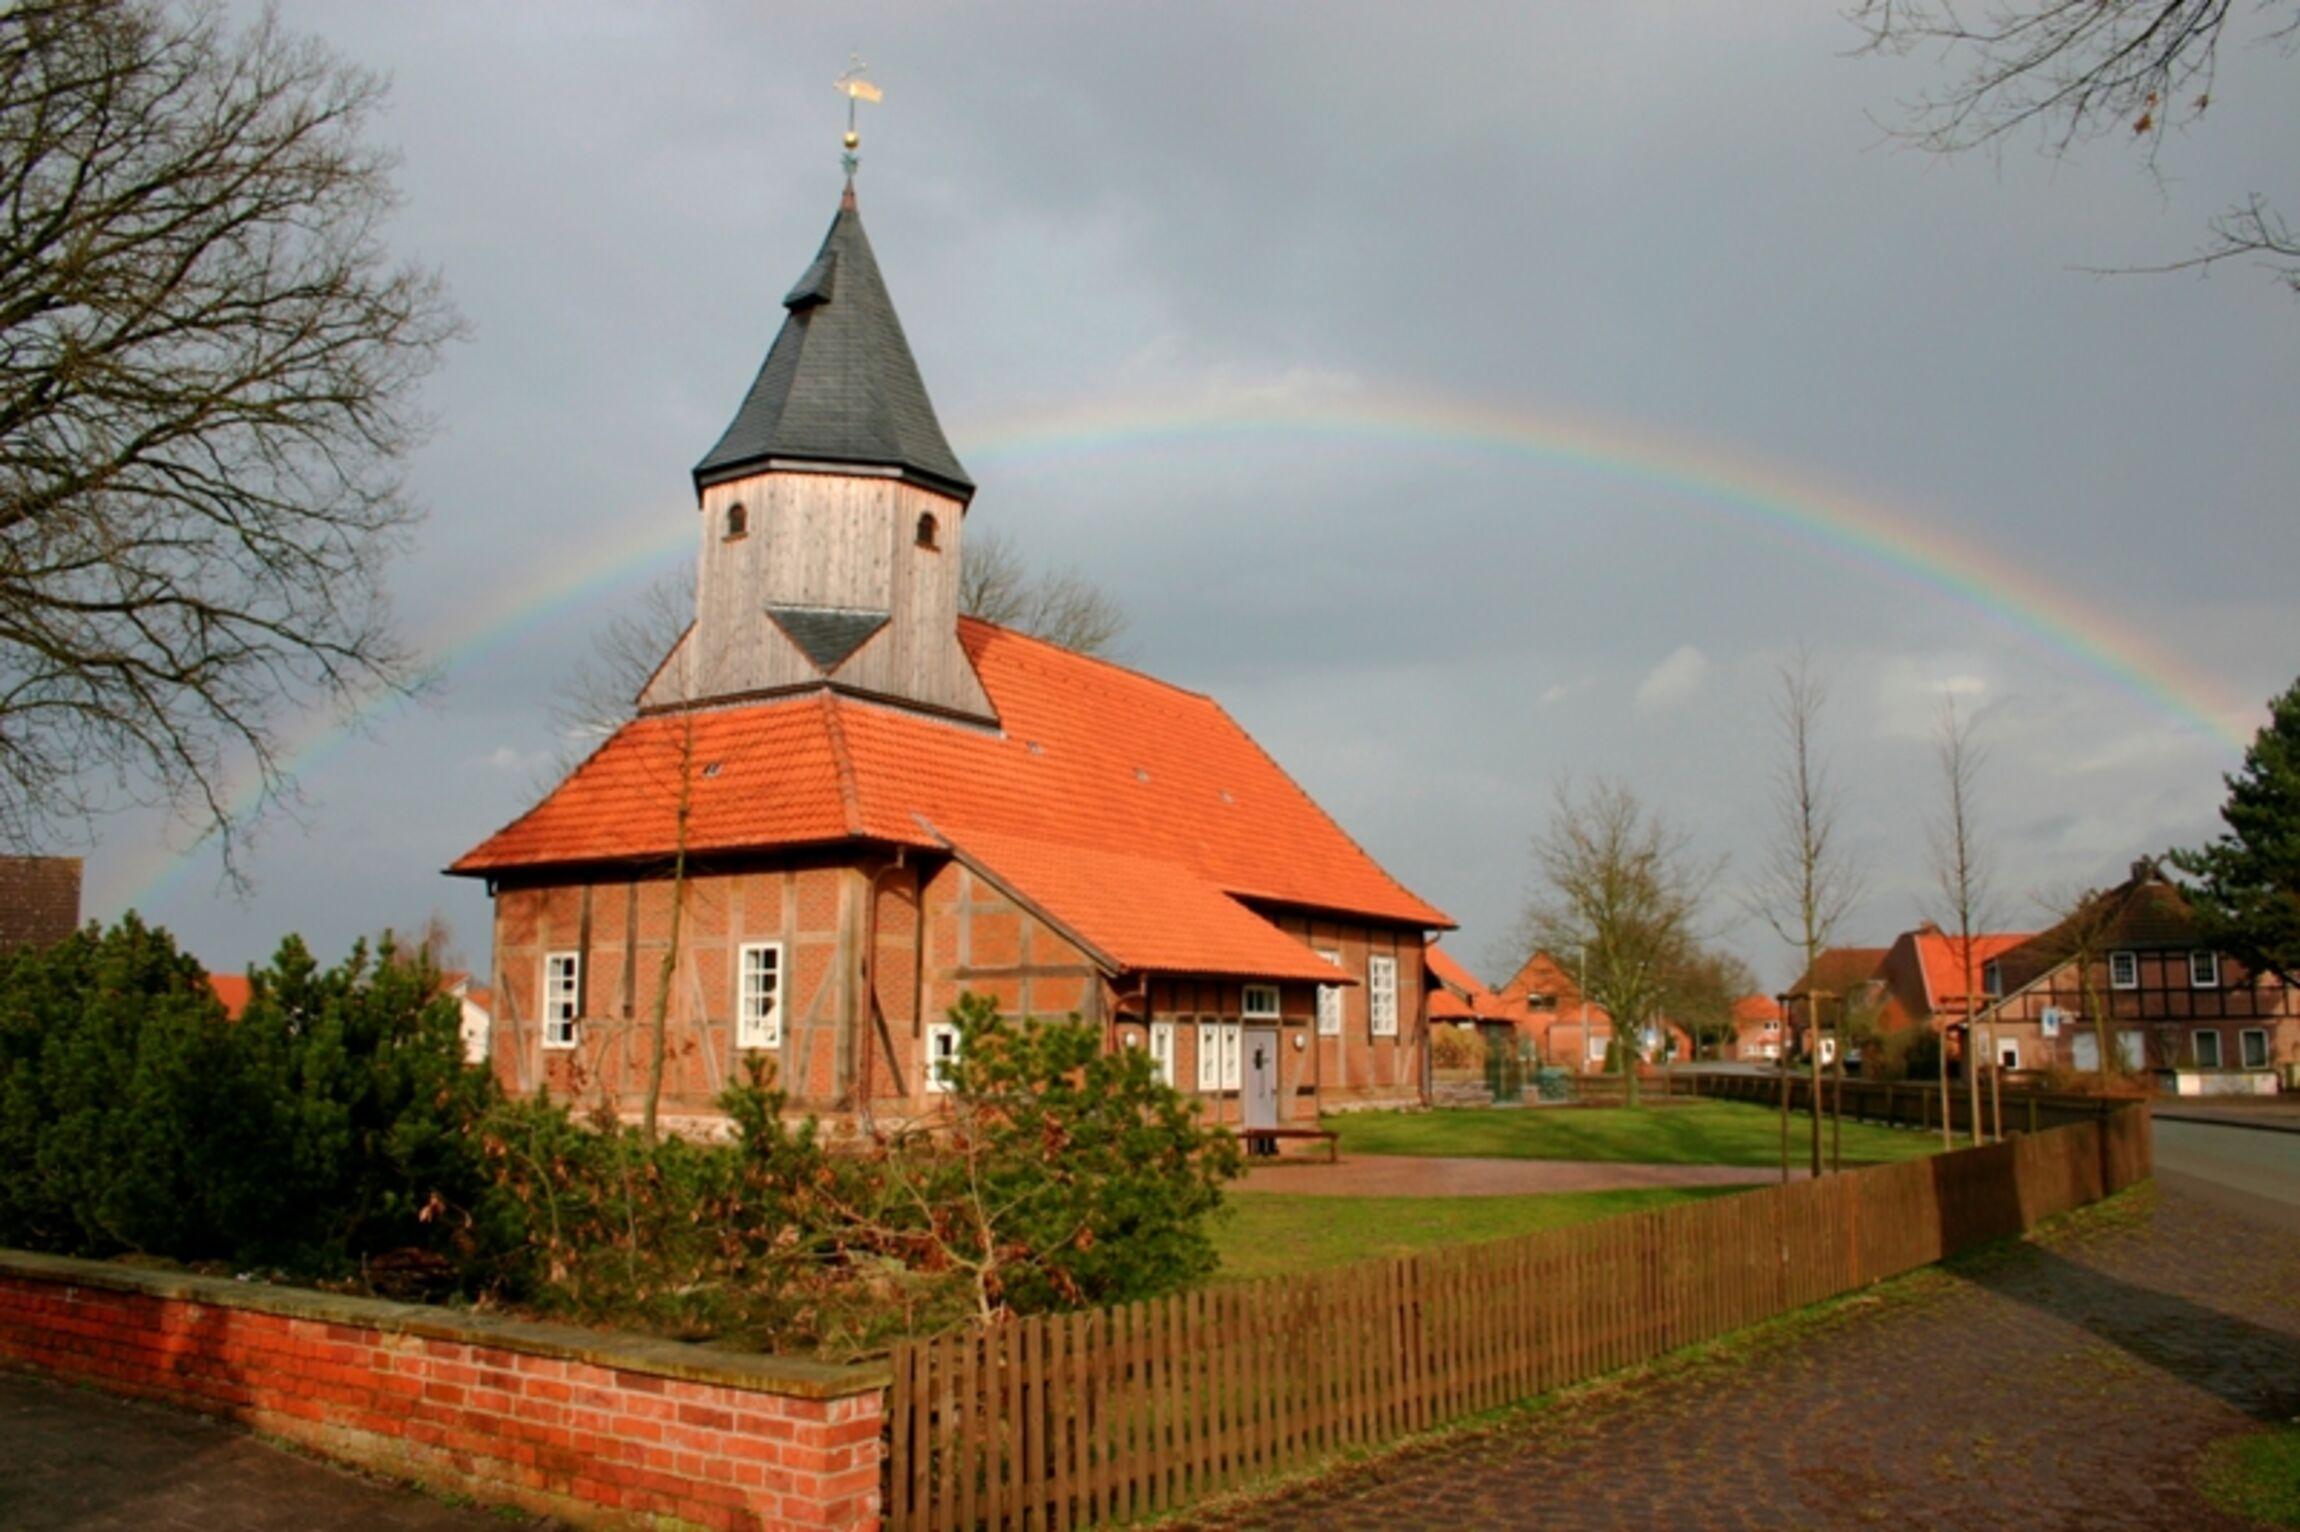 Kirche Erichshagen